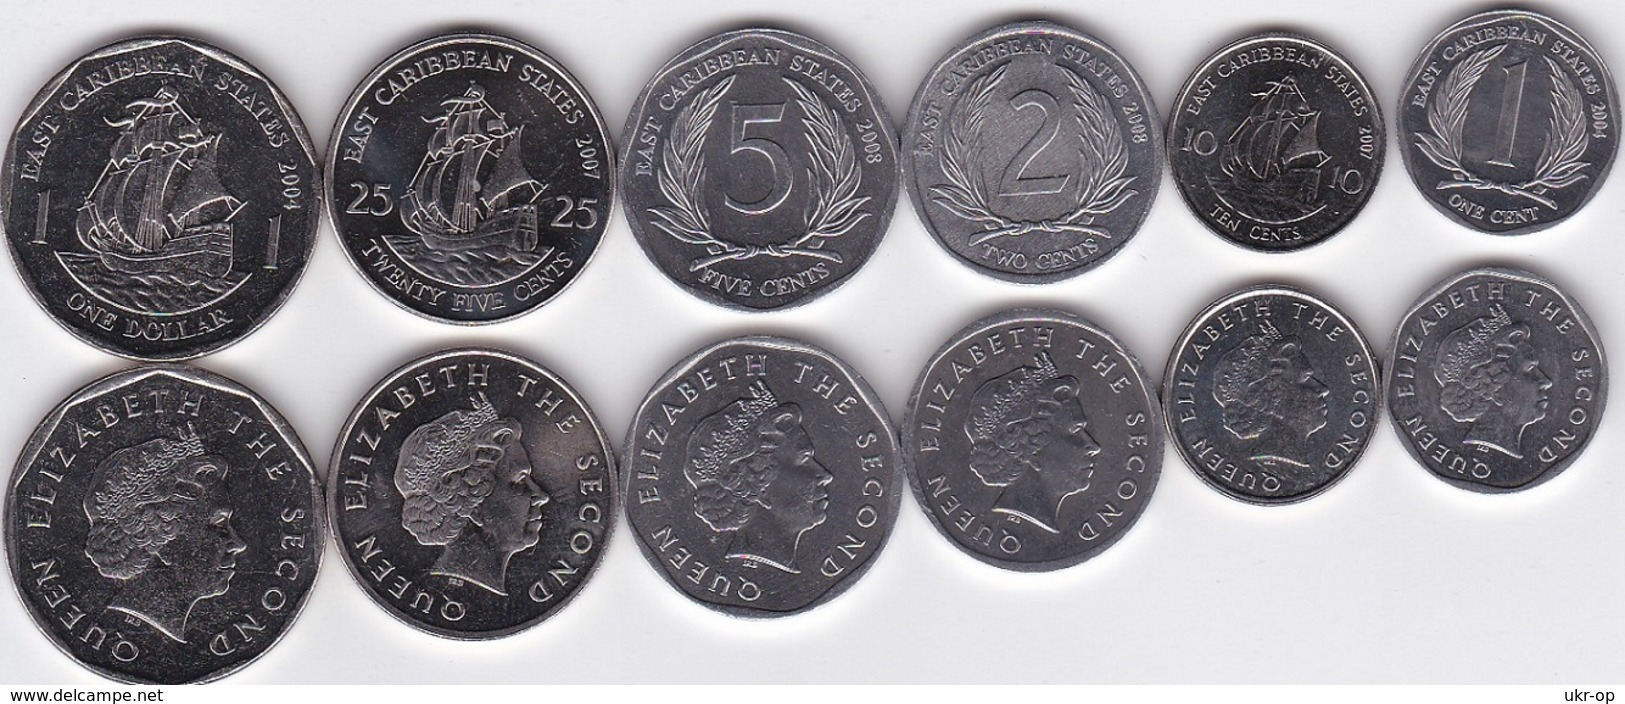 Eastern Caribbean - Set 6 Coins 1 + 2 + 5 + 10 + 25 Cents + 1 Dollar 2004 - 2008 UNC Ukr-OP - Caribe Oriental (Estados Del)